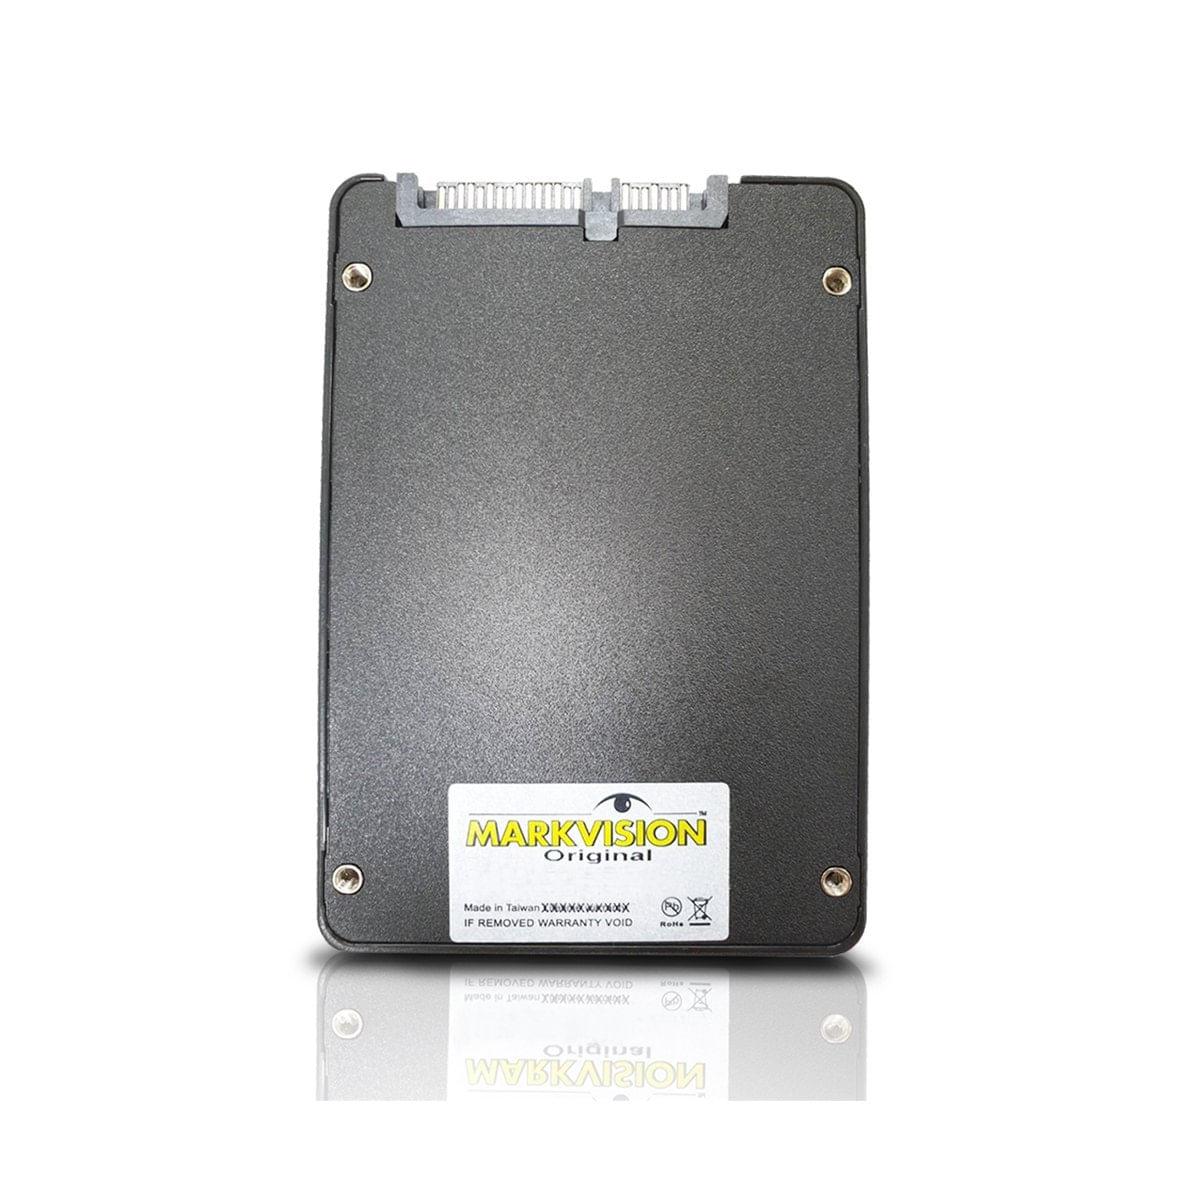 Ssd 240gb 2.5 Sata 3 500mb/s Leit - 400mb/s Gravacao  MVSD240G25-S2 Markvision